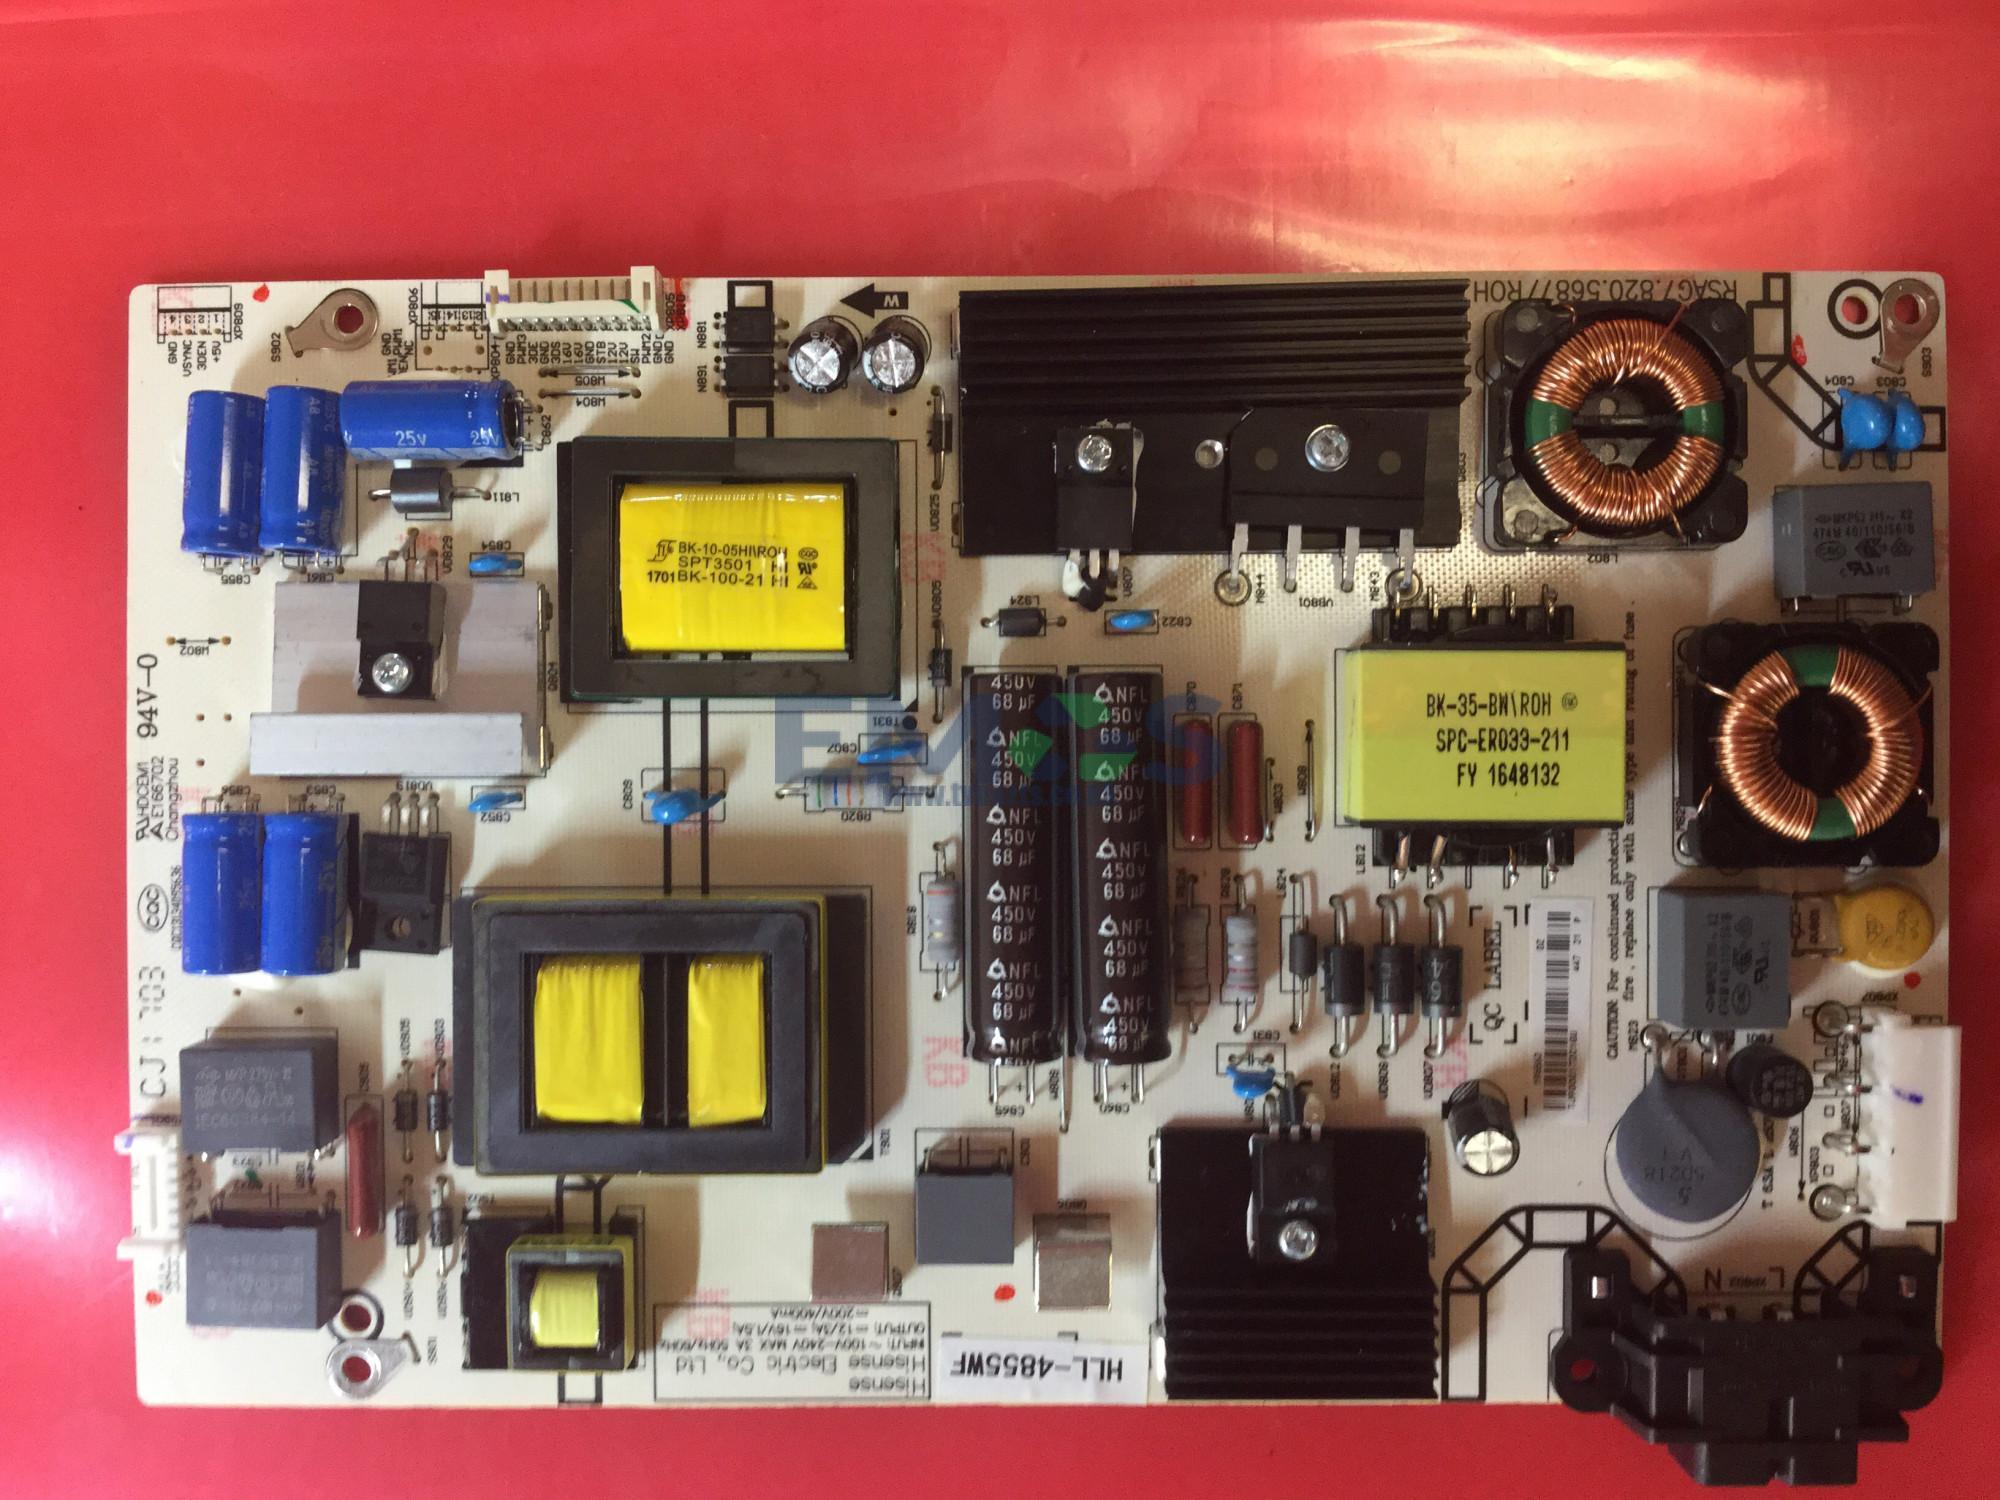 HLL-4855WF RSAG7 820 5687/ROH POWER SUPPLY FOR HISENSE H50M3300